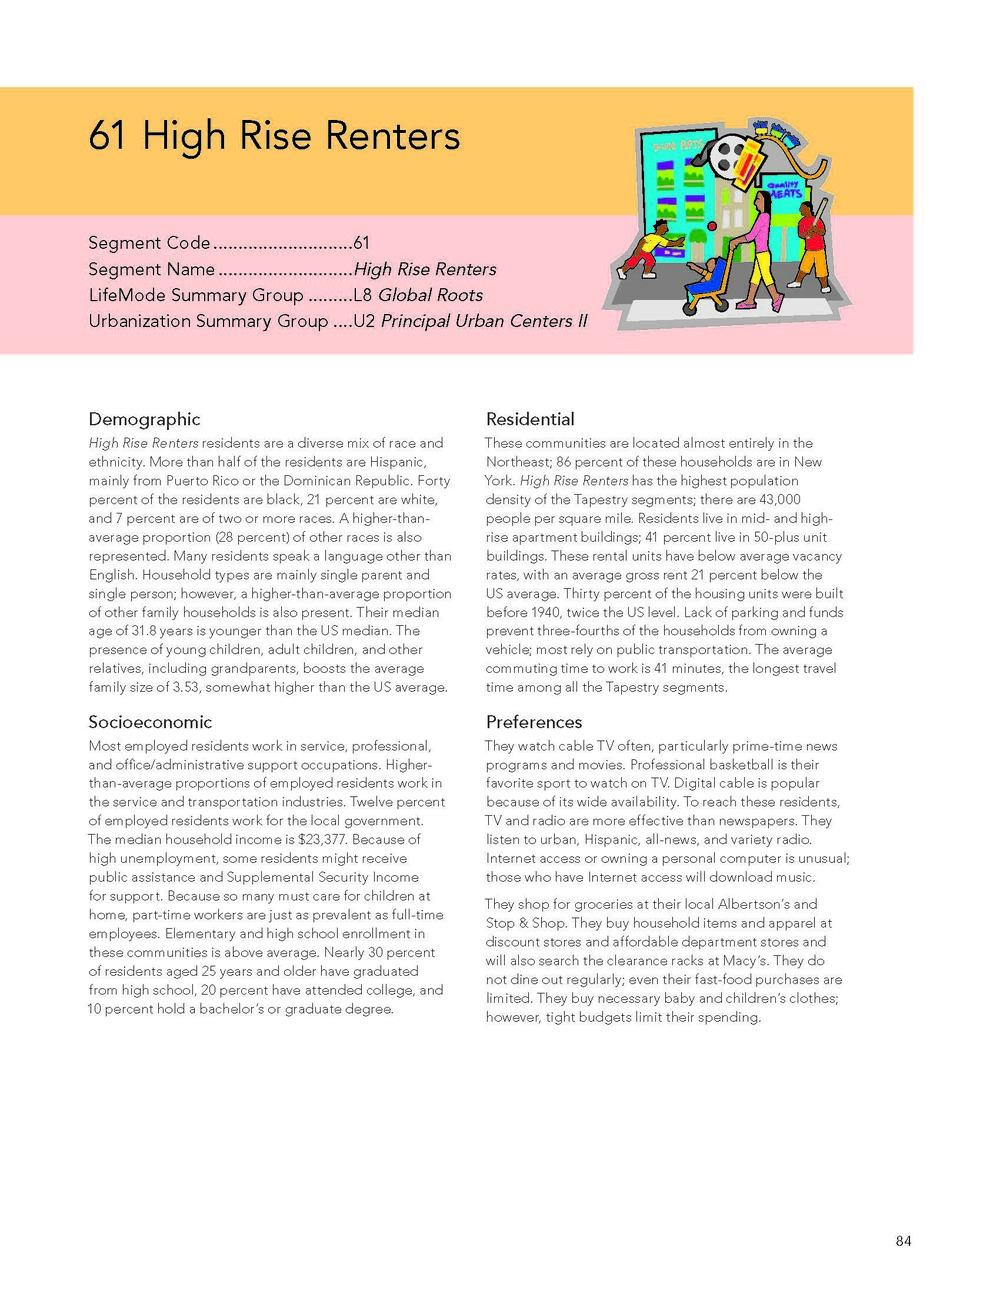 tapestry-segmentation_Page_87.jpg